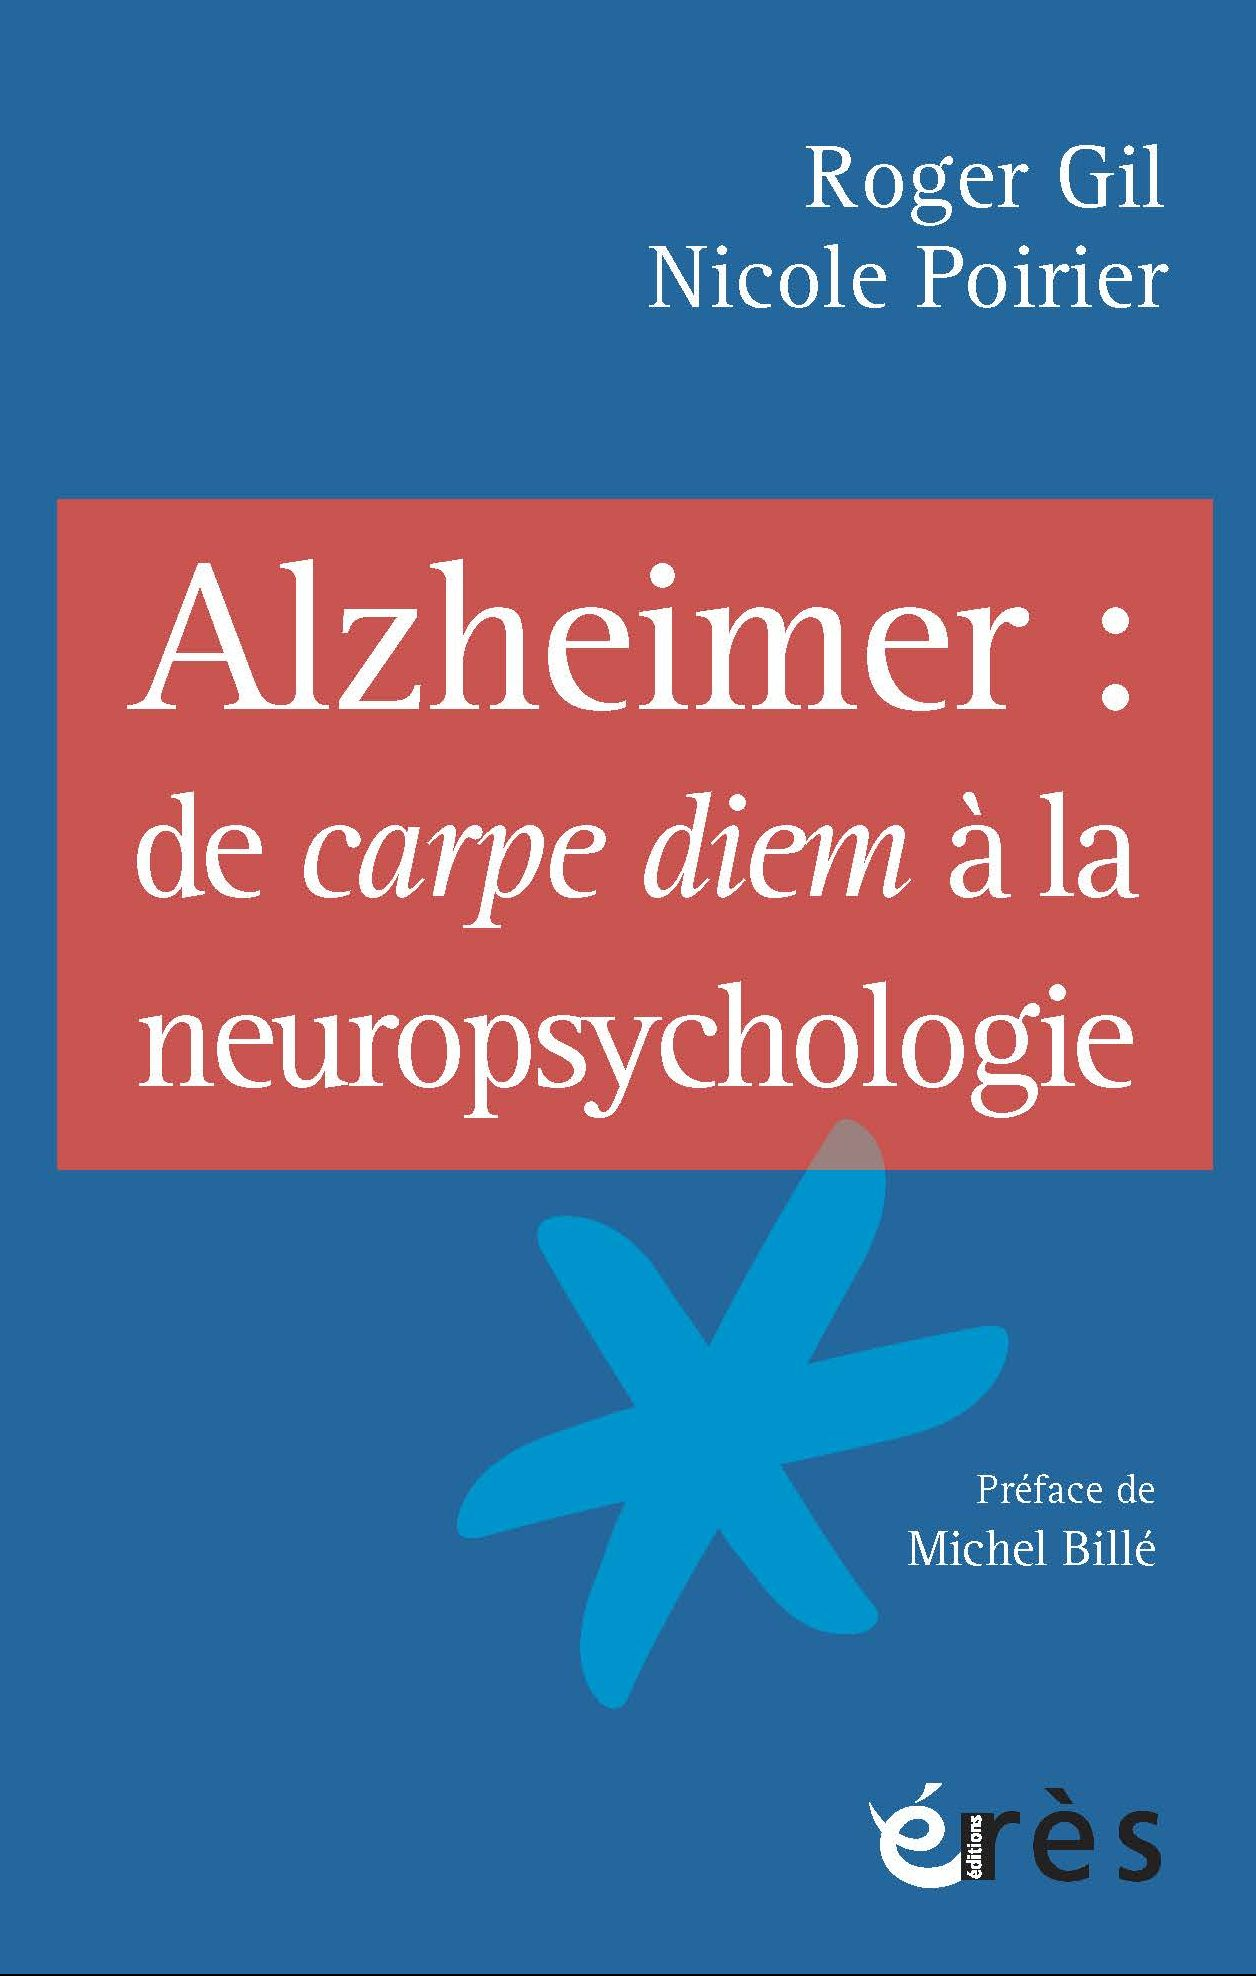 Alzheimer - de Carpe Diem a la neuropsychologie